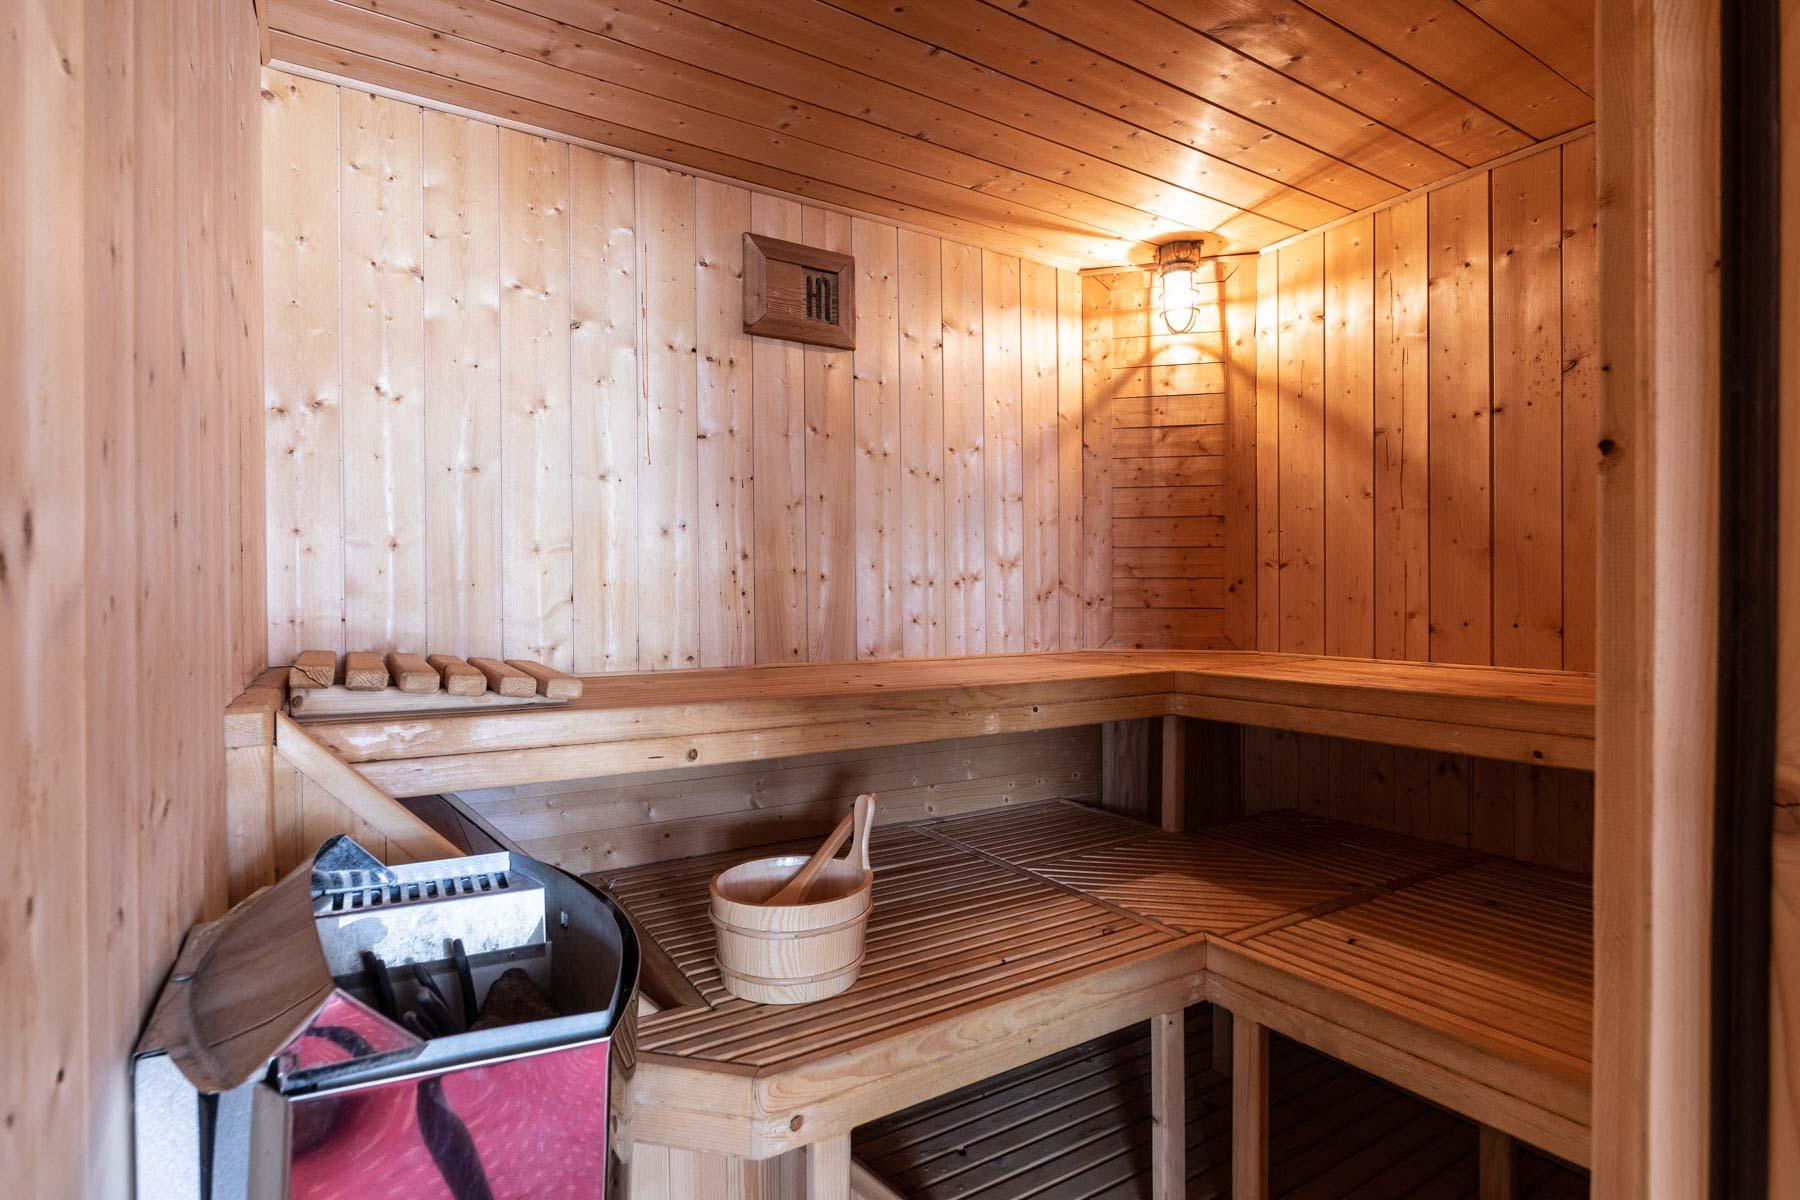 Avoriaz Appt 1954 Sauna